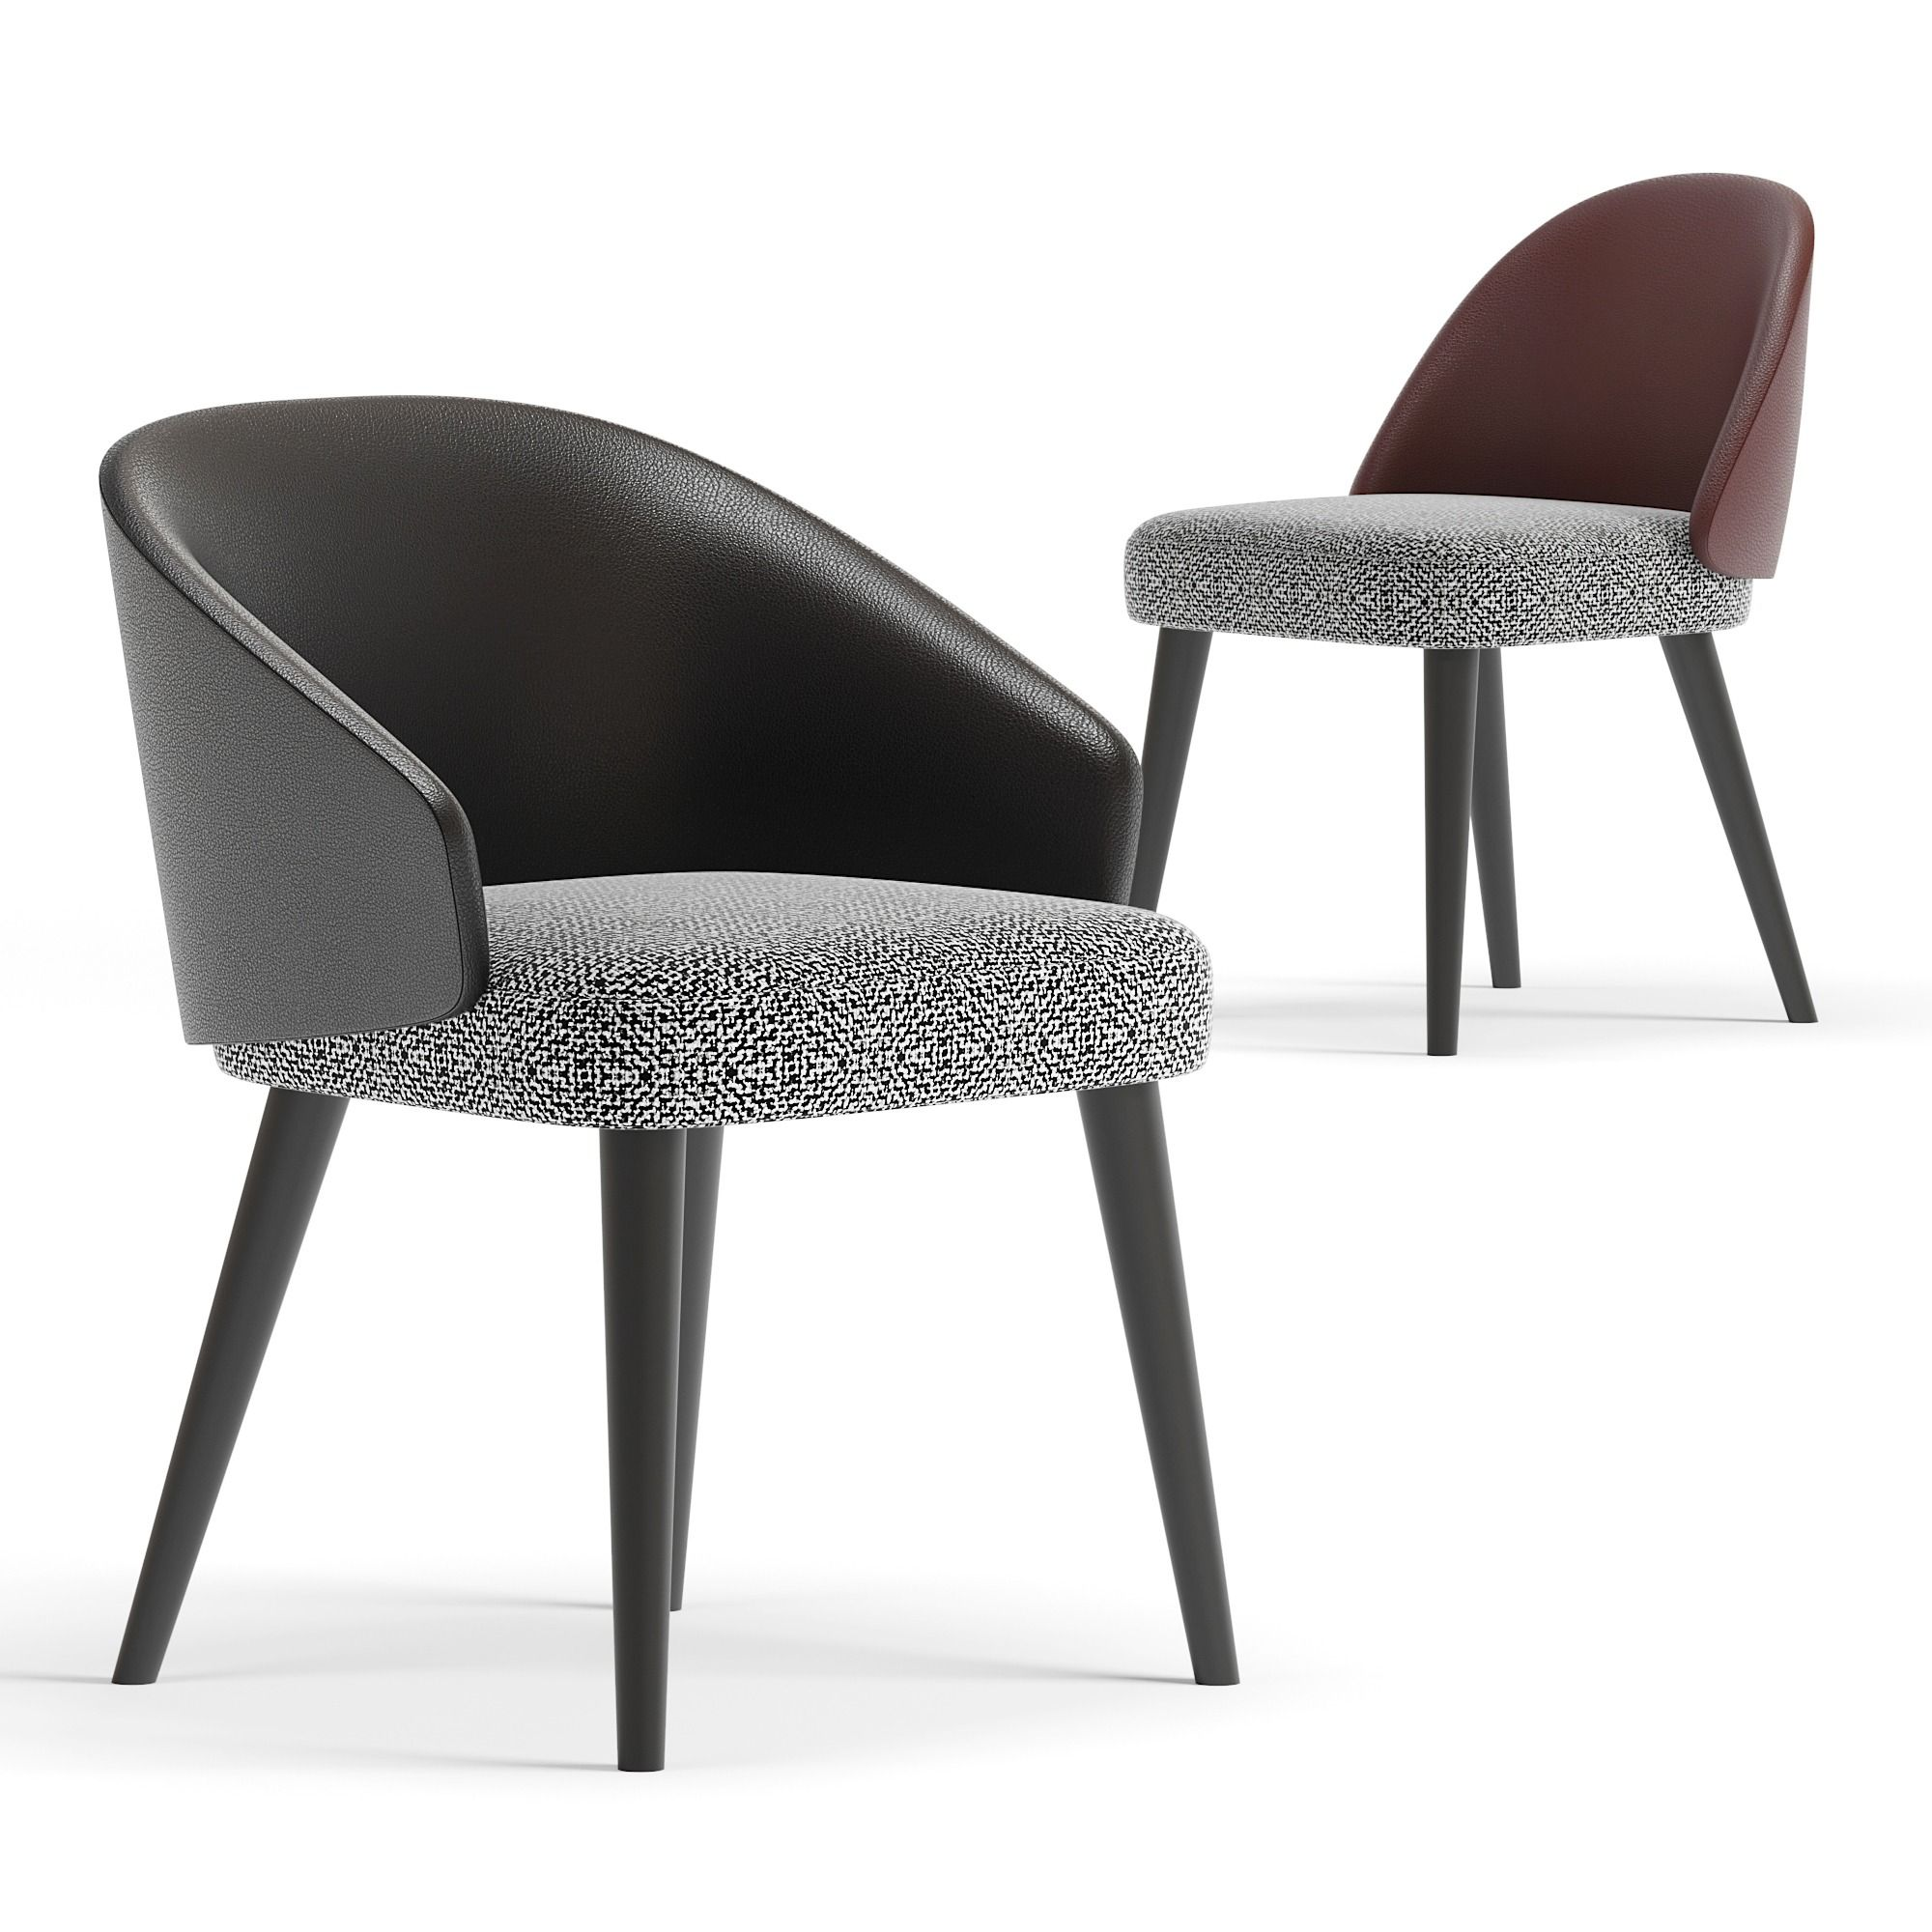 Lawson Dining Chair Minotti Minotti Lawson Chair Dining Chair